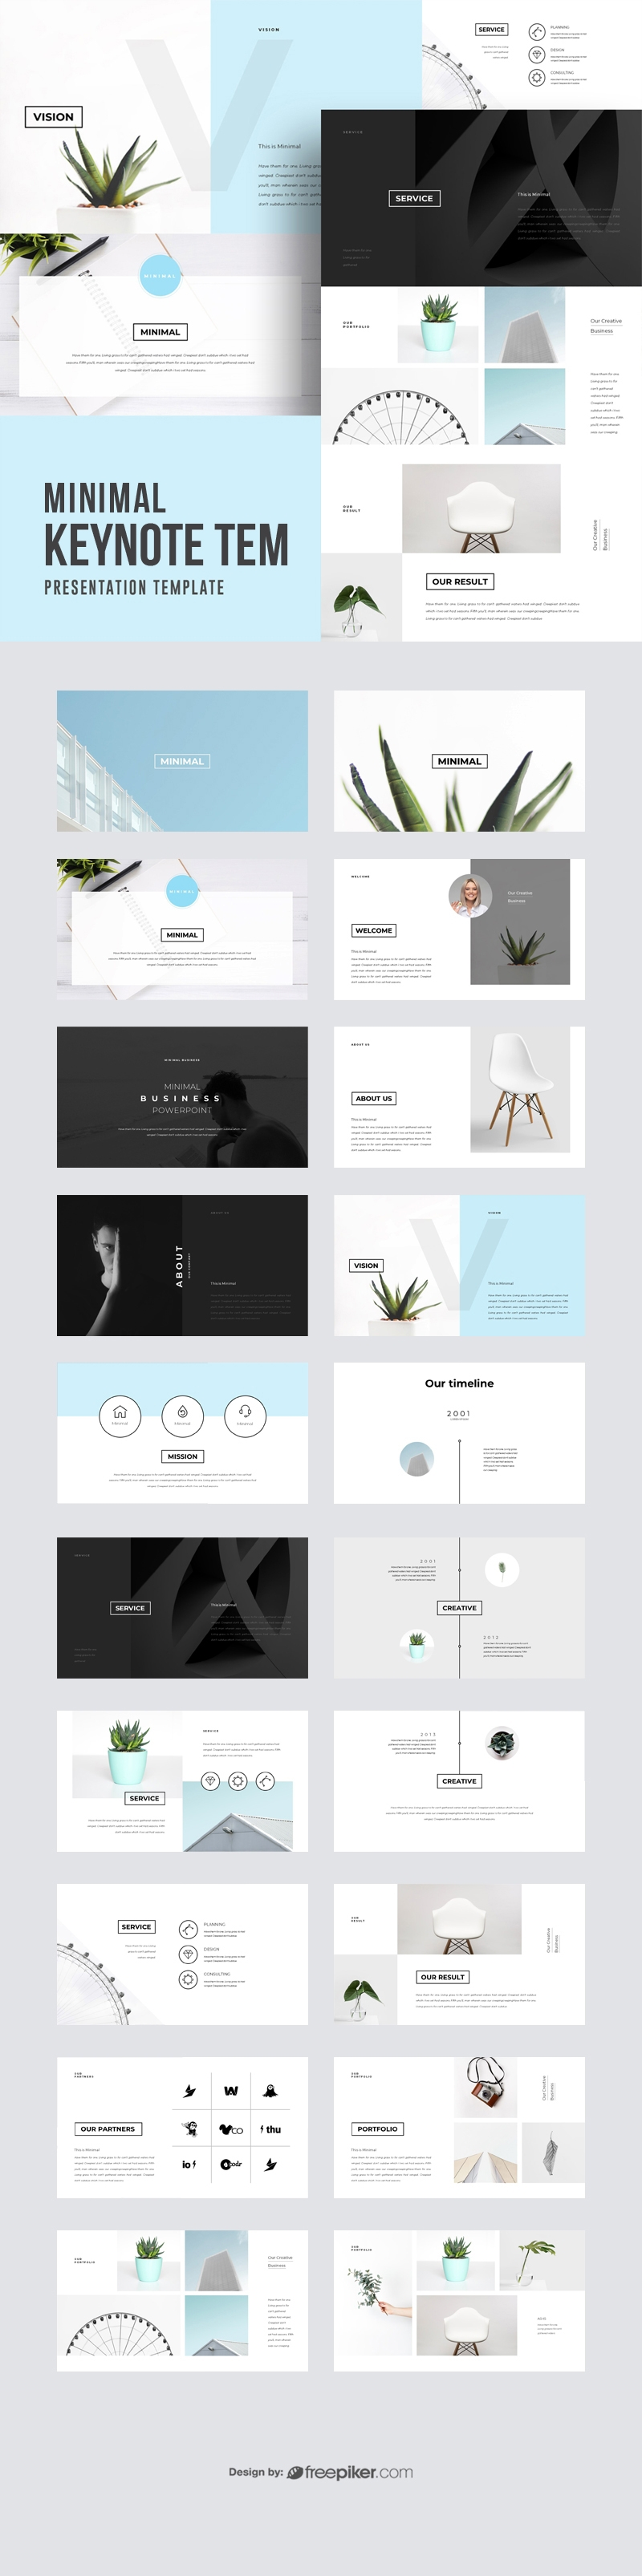 freepiker minimal keynote template. Black Bedroom Furniture Sets. Home Design Ideas